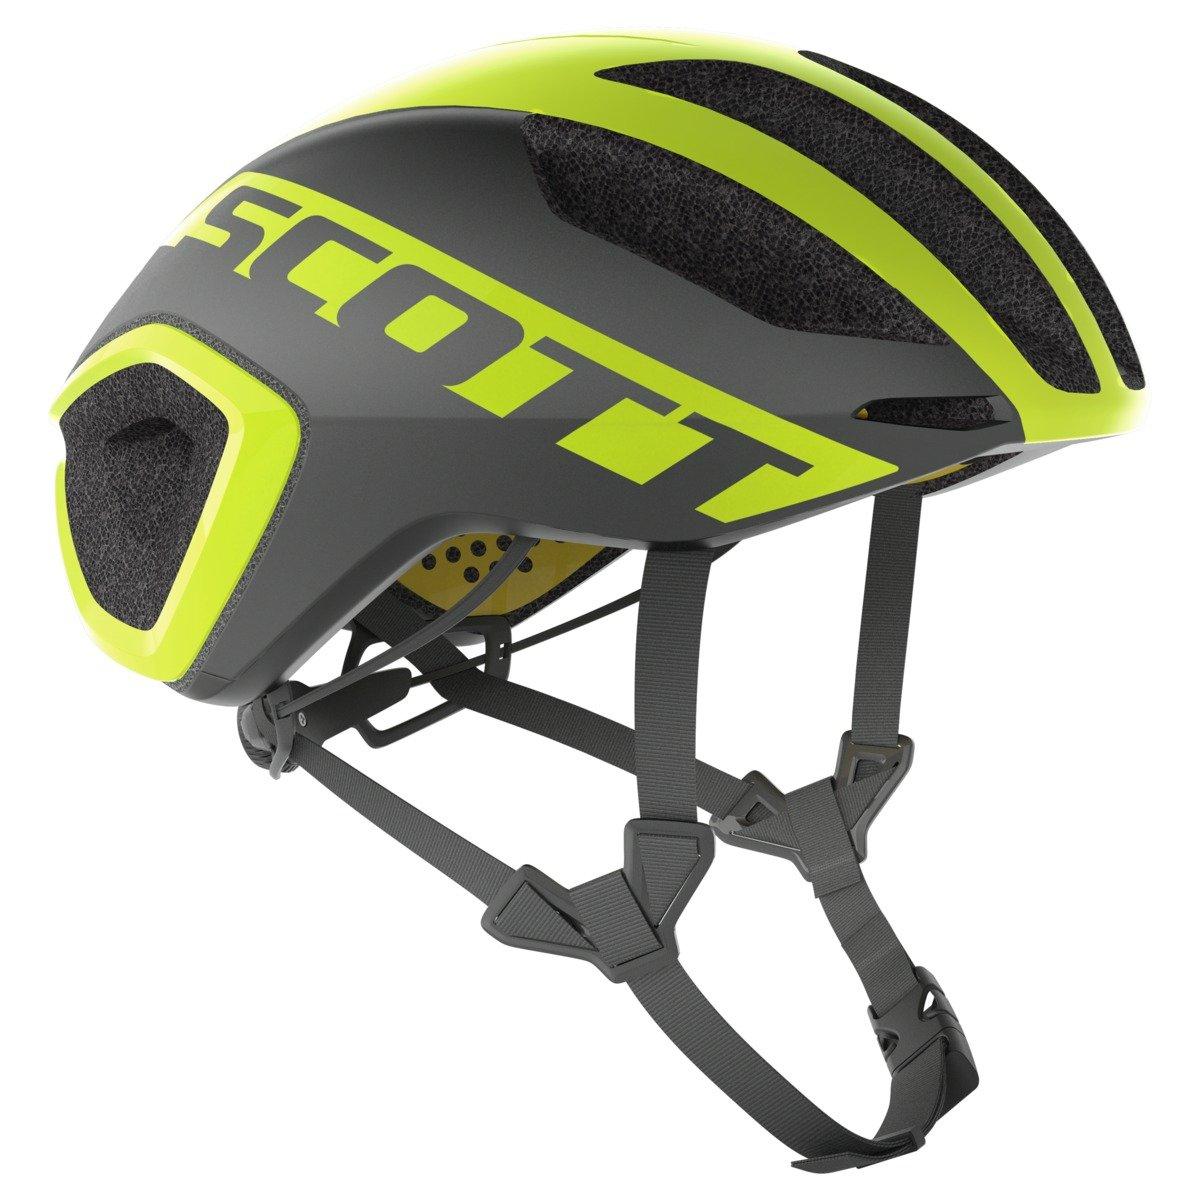 SCOTT(スコット) ヘルメット Helmet Cadence PLUS yellow RC L 2500265859008 L   B071WX7625